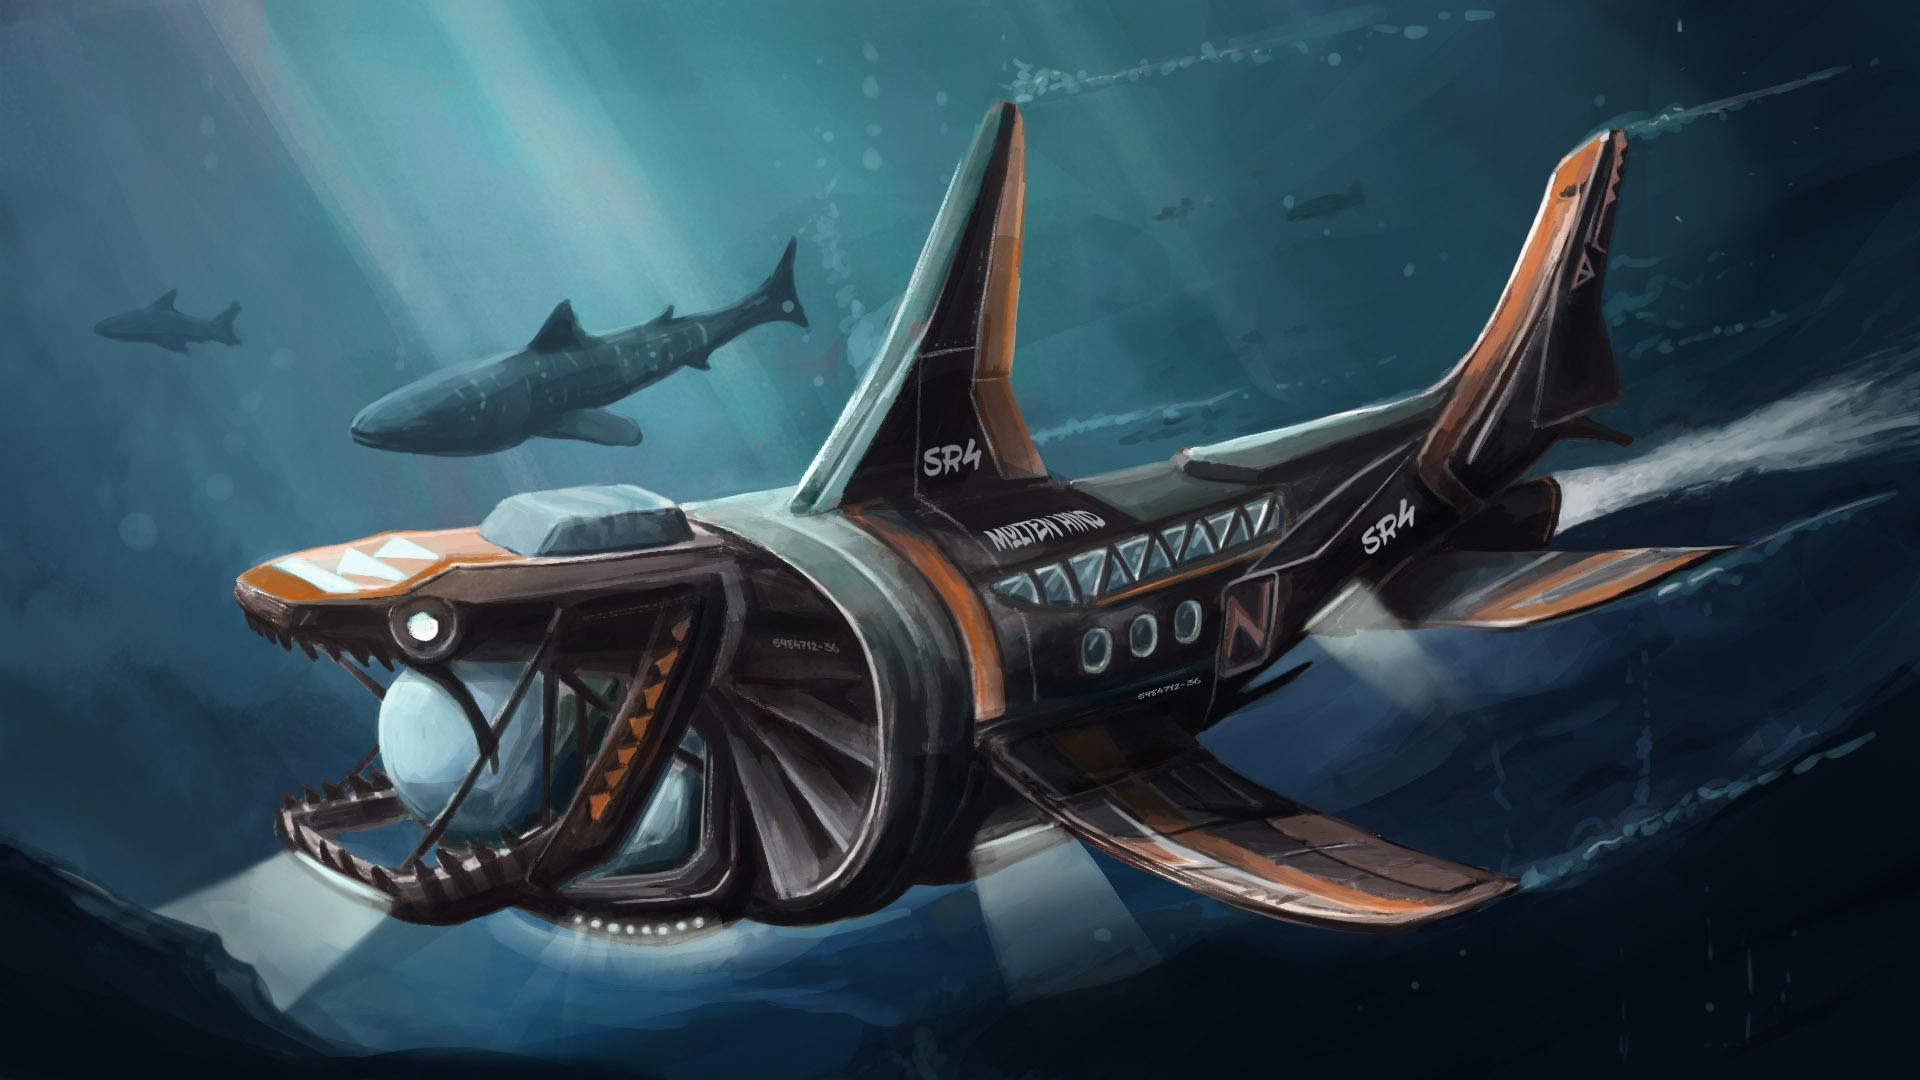 Sea deviant (SebastianBurke)